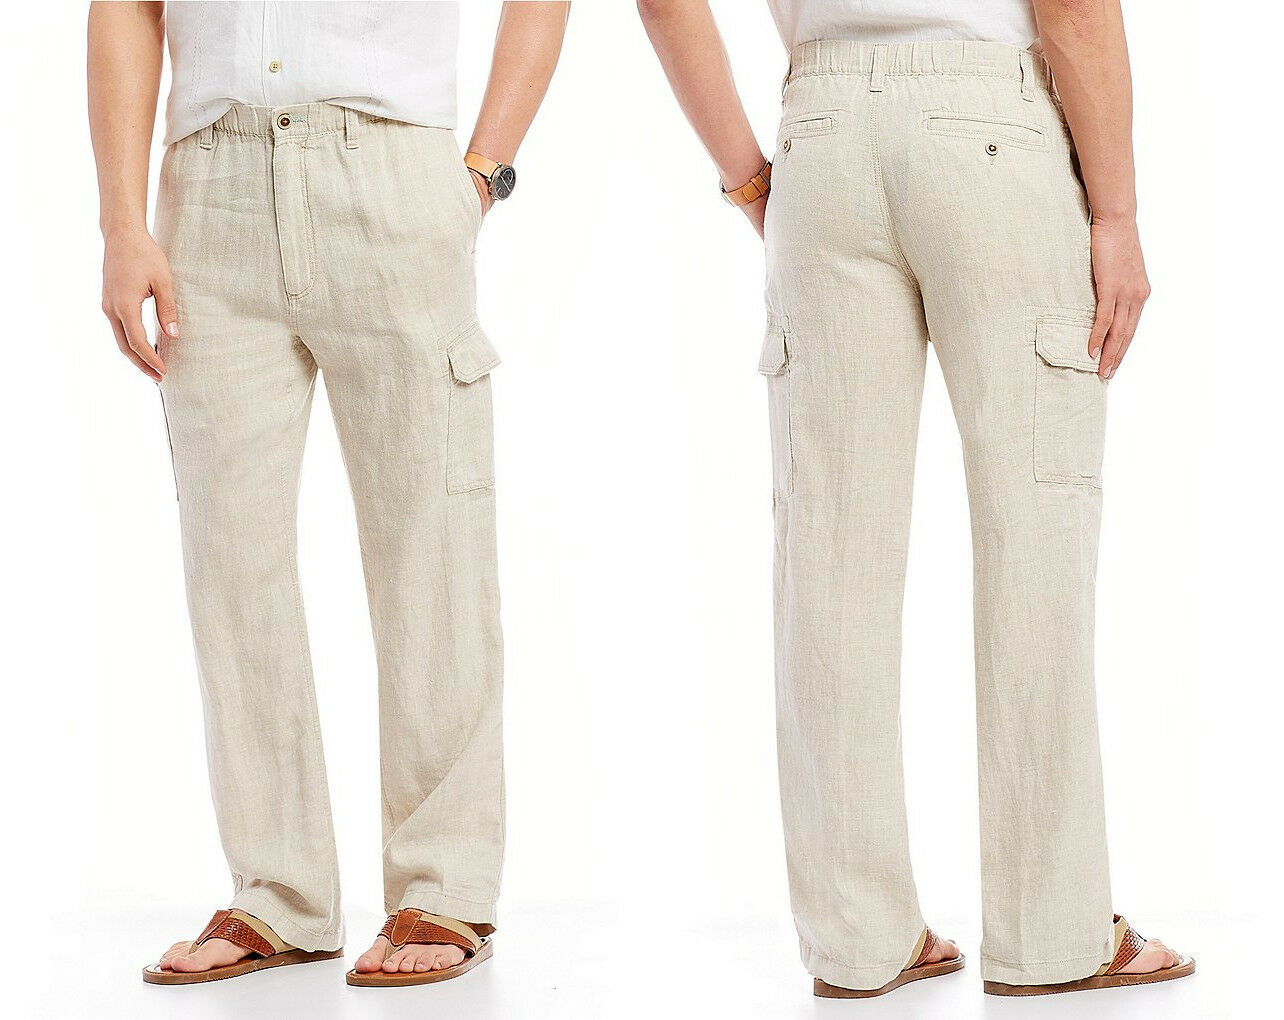 Caribbean Men's Solid 100% Linen Cargo Flat Front Drawstring Pants in Natural